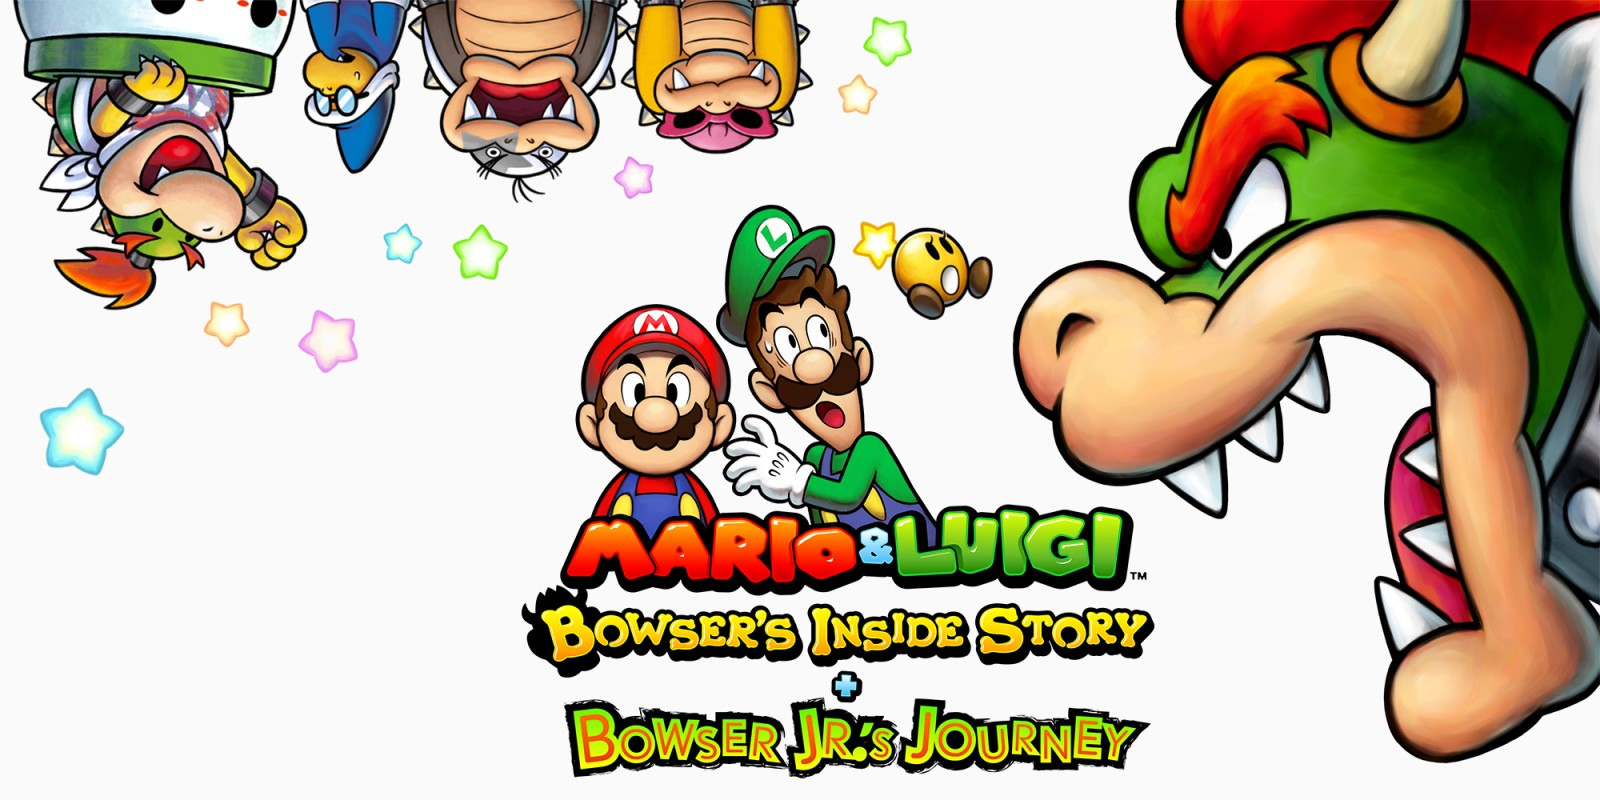 Mario & Luigi Bowser's Inside Story + Bowser Jrs Journey, Nintendo, 3DS, GamersRD